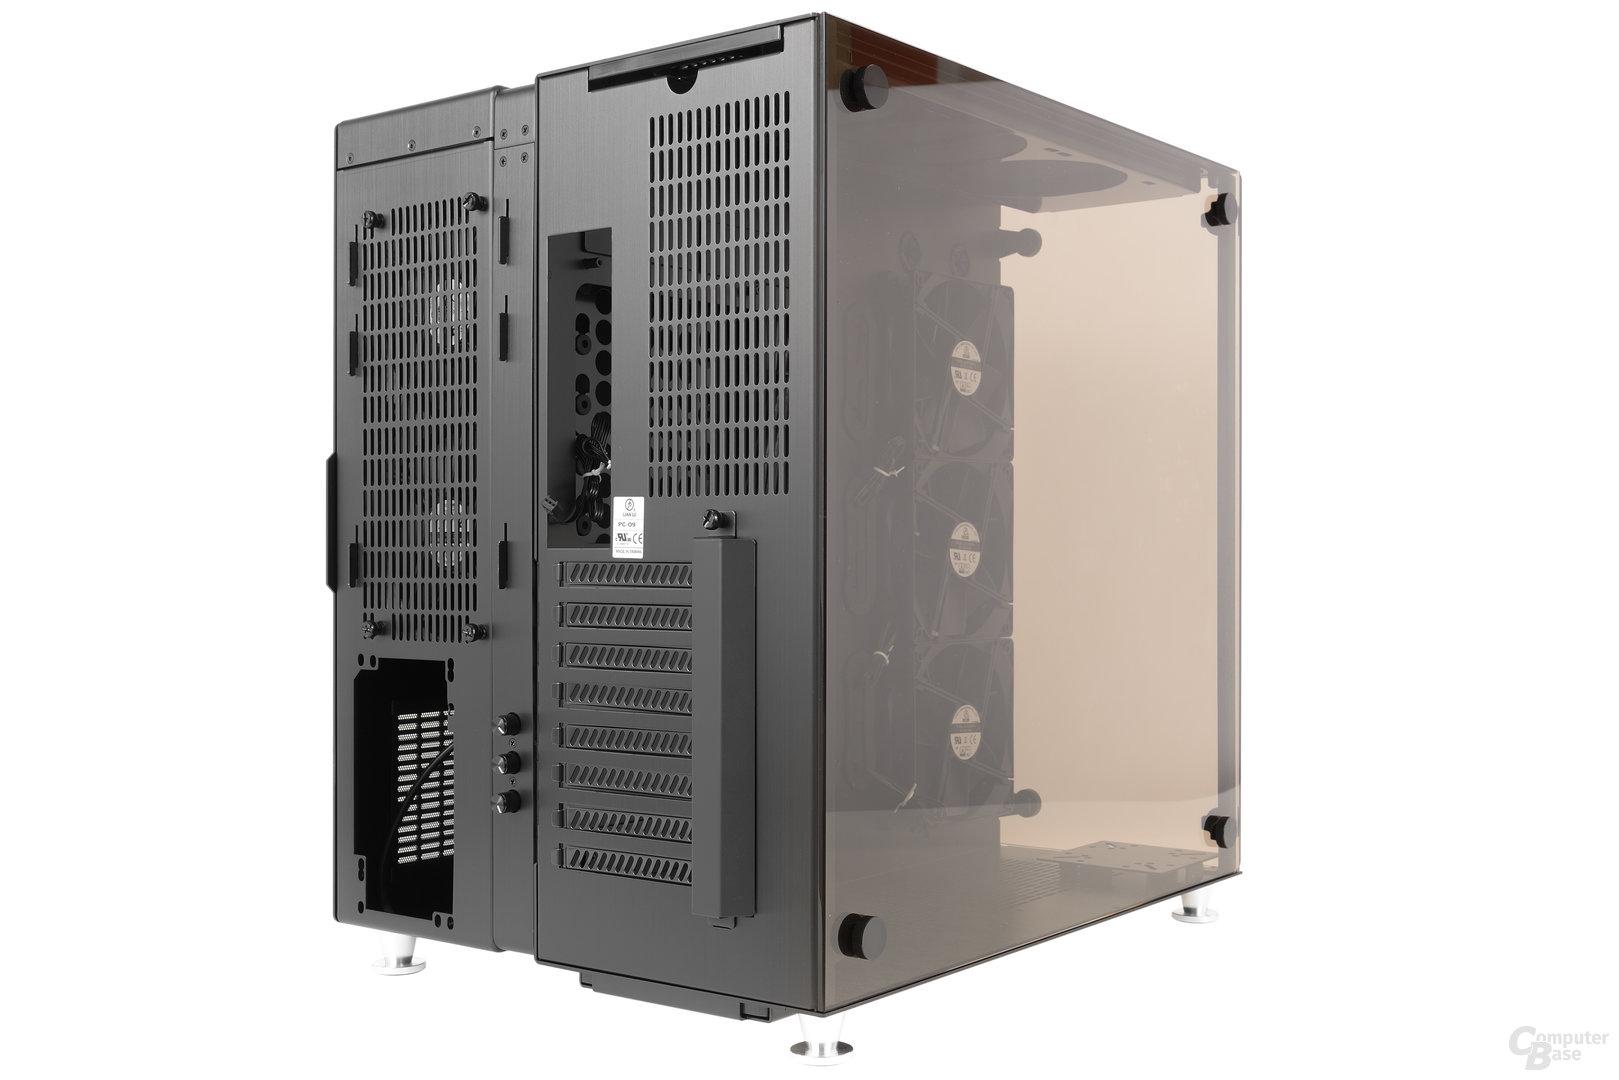 Lian Li PC-O9 – Seitliche Heckansicht